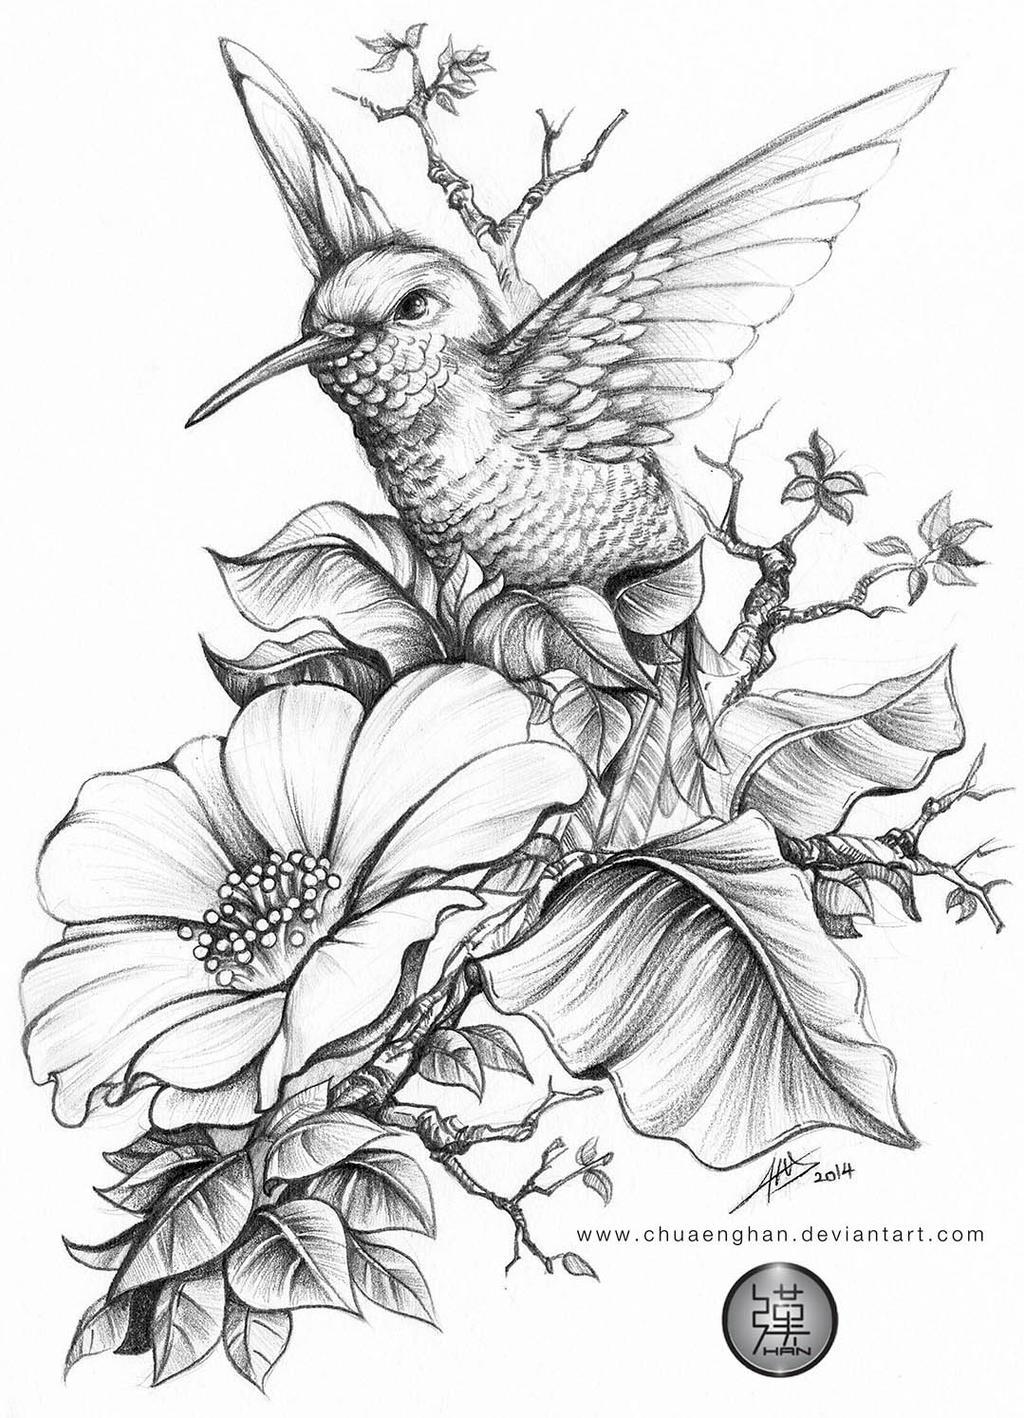 Hummingbird by chuaenghan on DeviantArt